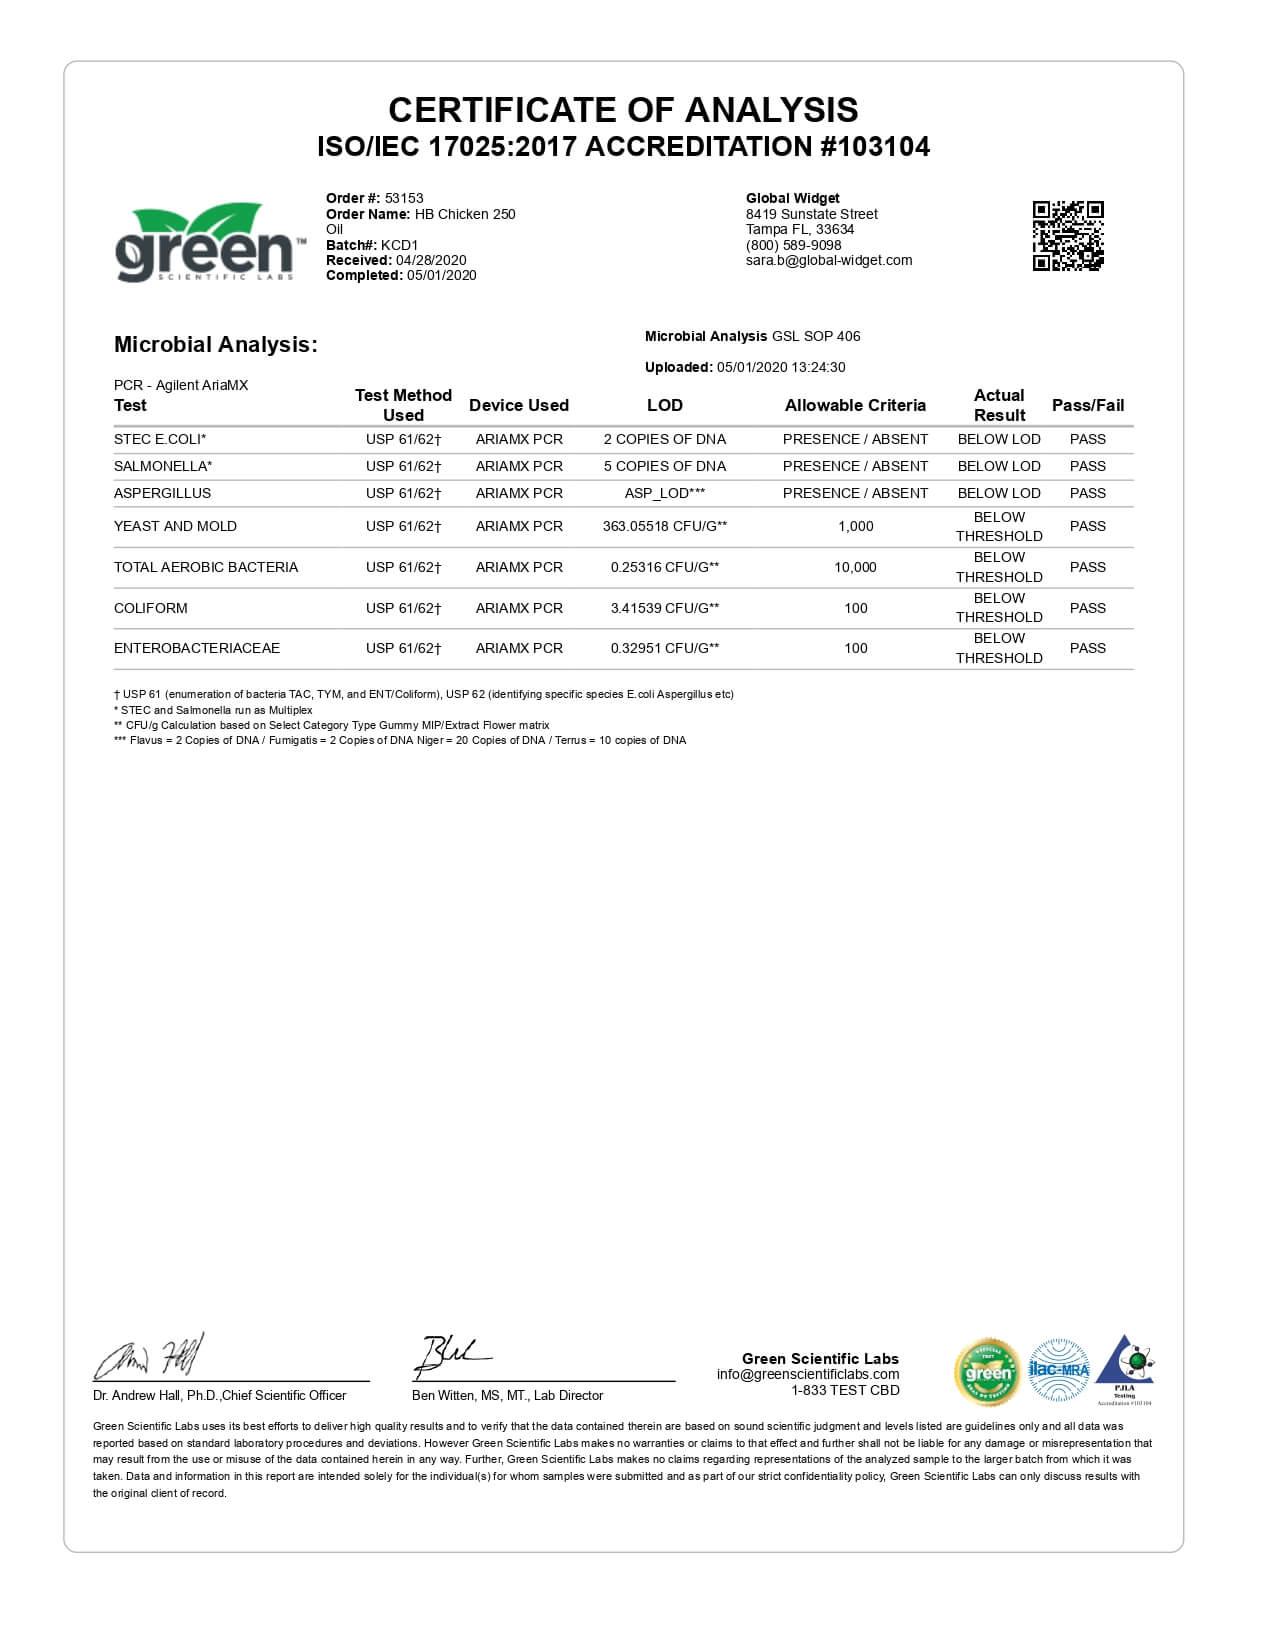 Hemp Bombs CBD Pet Tincture Chicken Flavor 250mg Lab Report